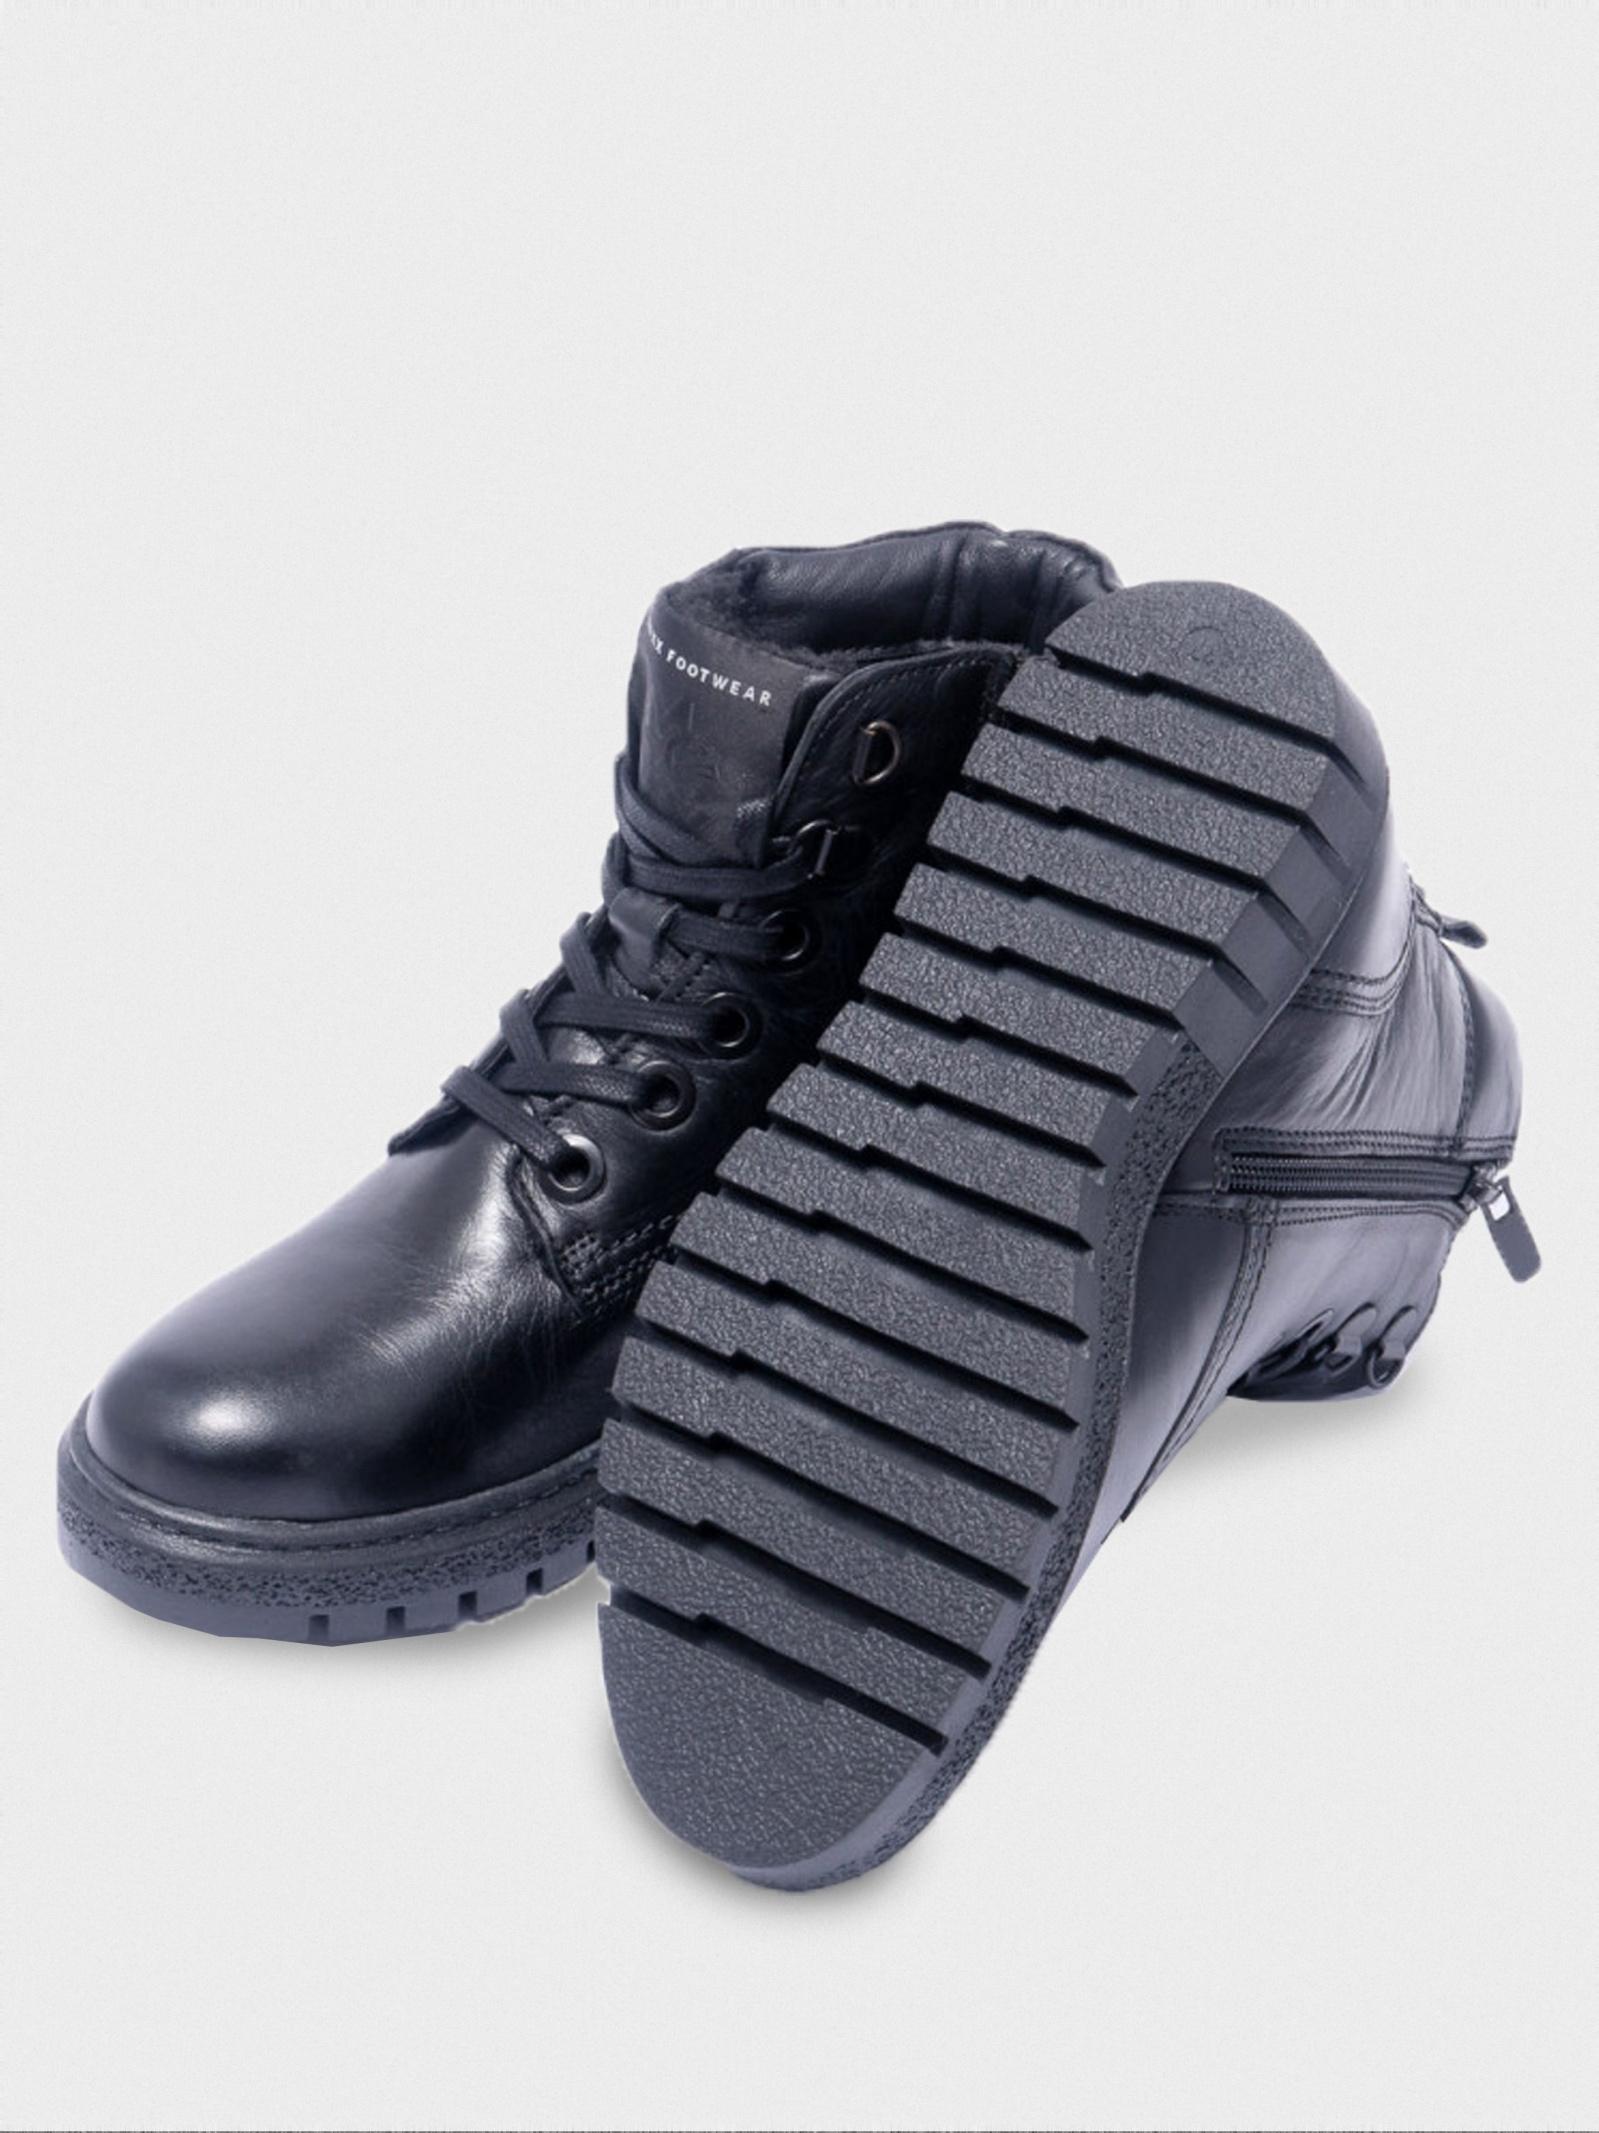 Ботинки женские MEXX 7L70 купить онлайн, 2017